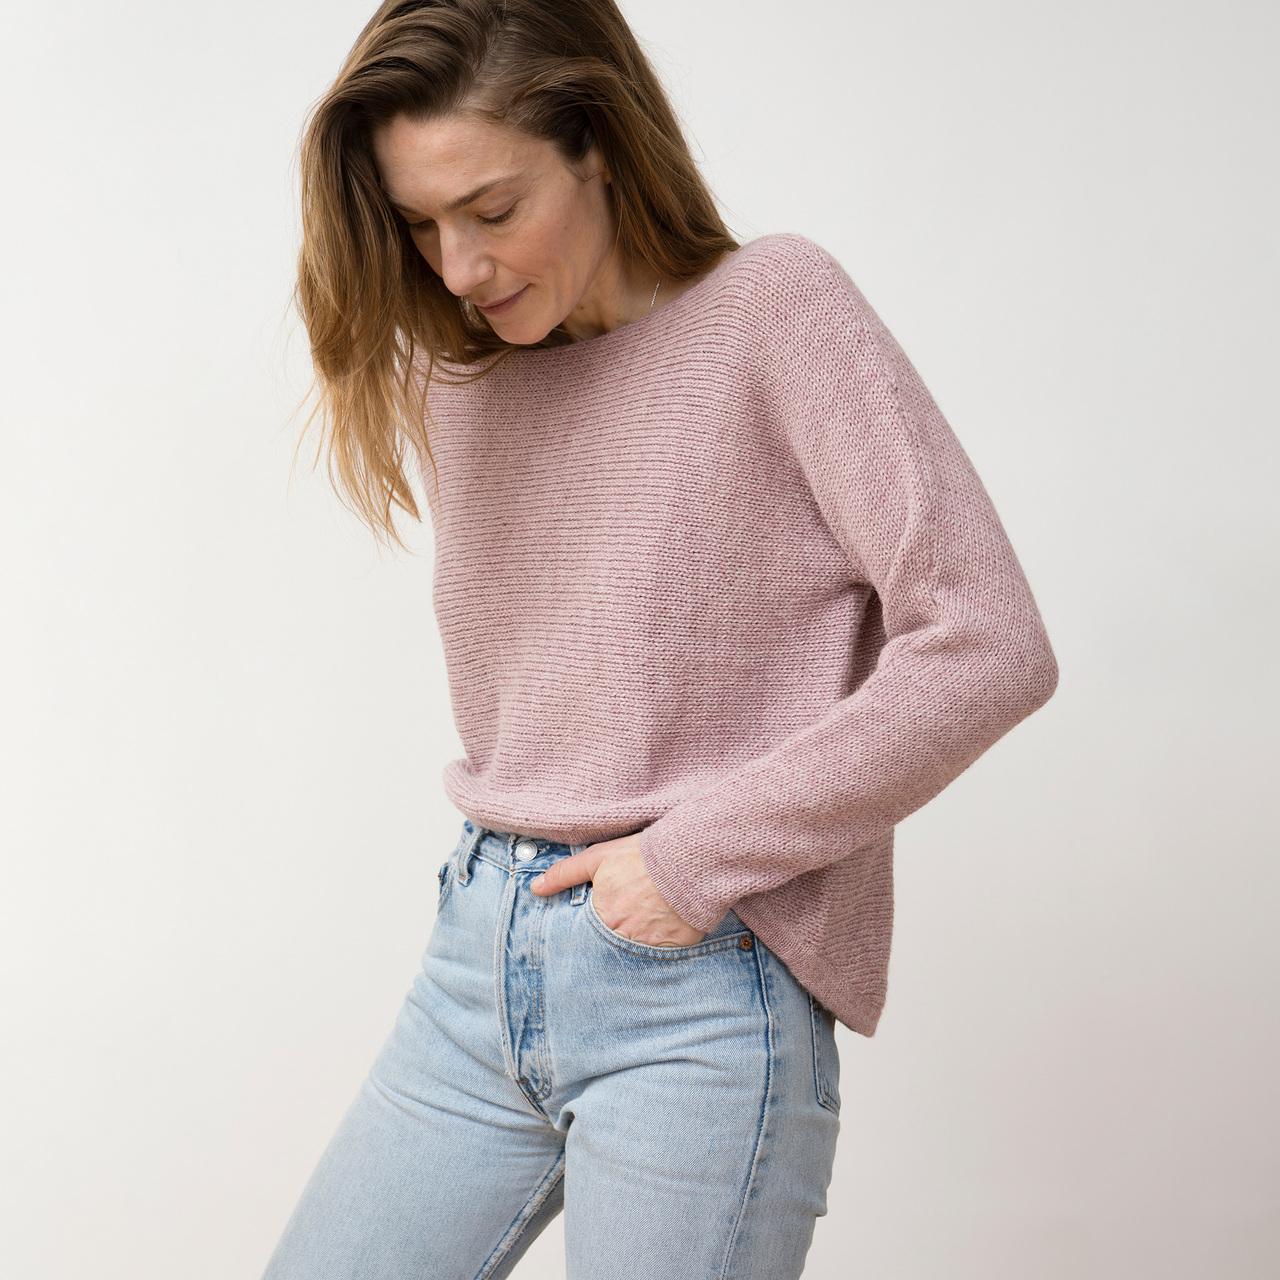 Nieve Sweater von 'Jungle Folk' in Himalaya Pink